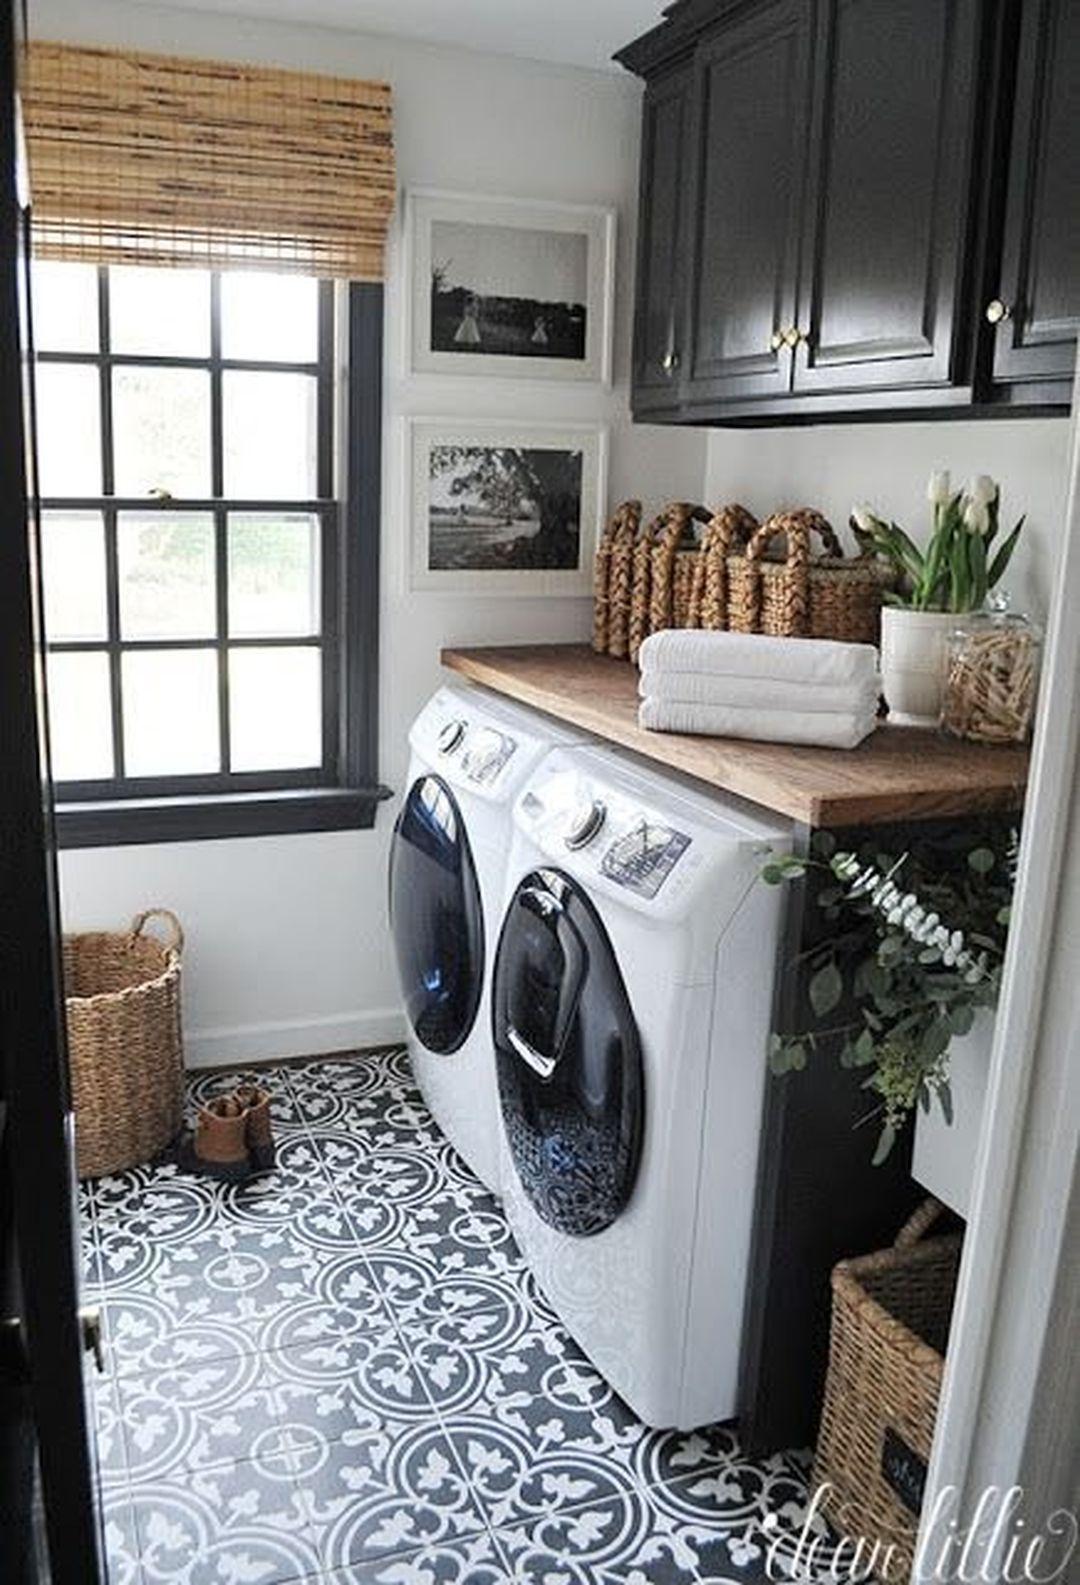 Best Laundry Mudroom Combo Ever Designed 09 Jpg 1 080 1 585 Pixels Laundry In Bathroom Laundry Mud Room Laundry Room Decor